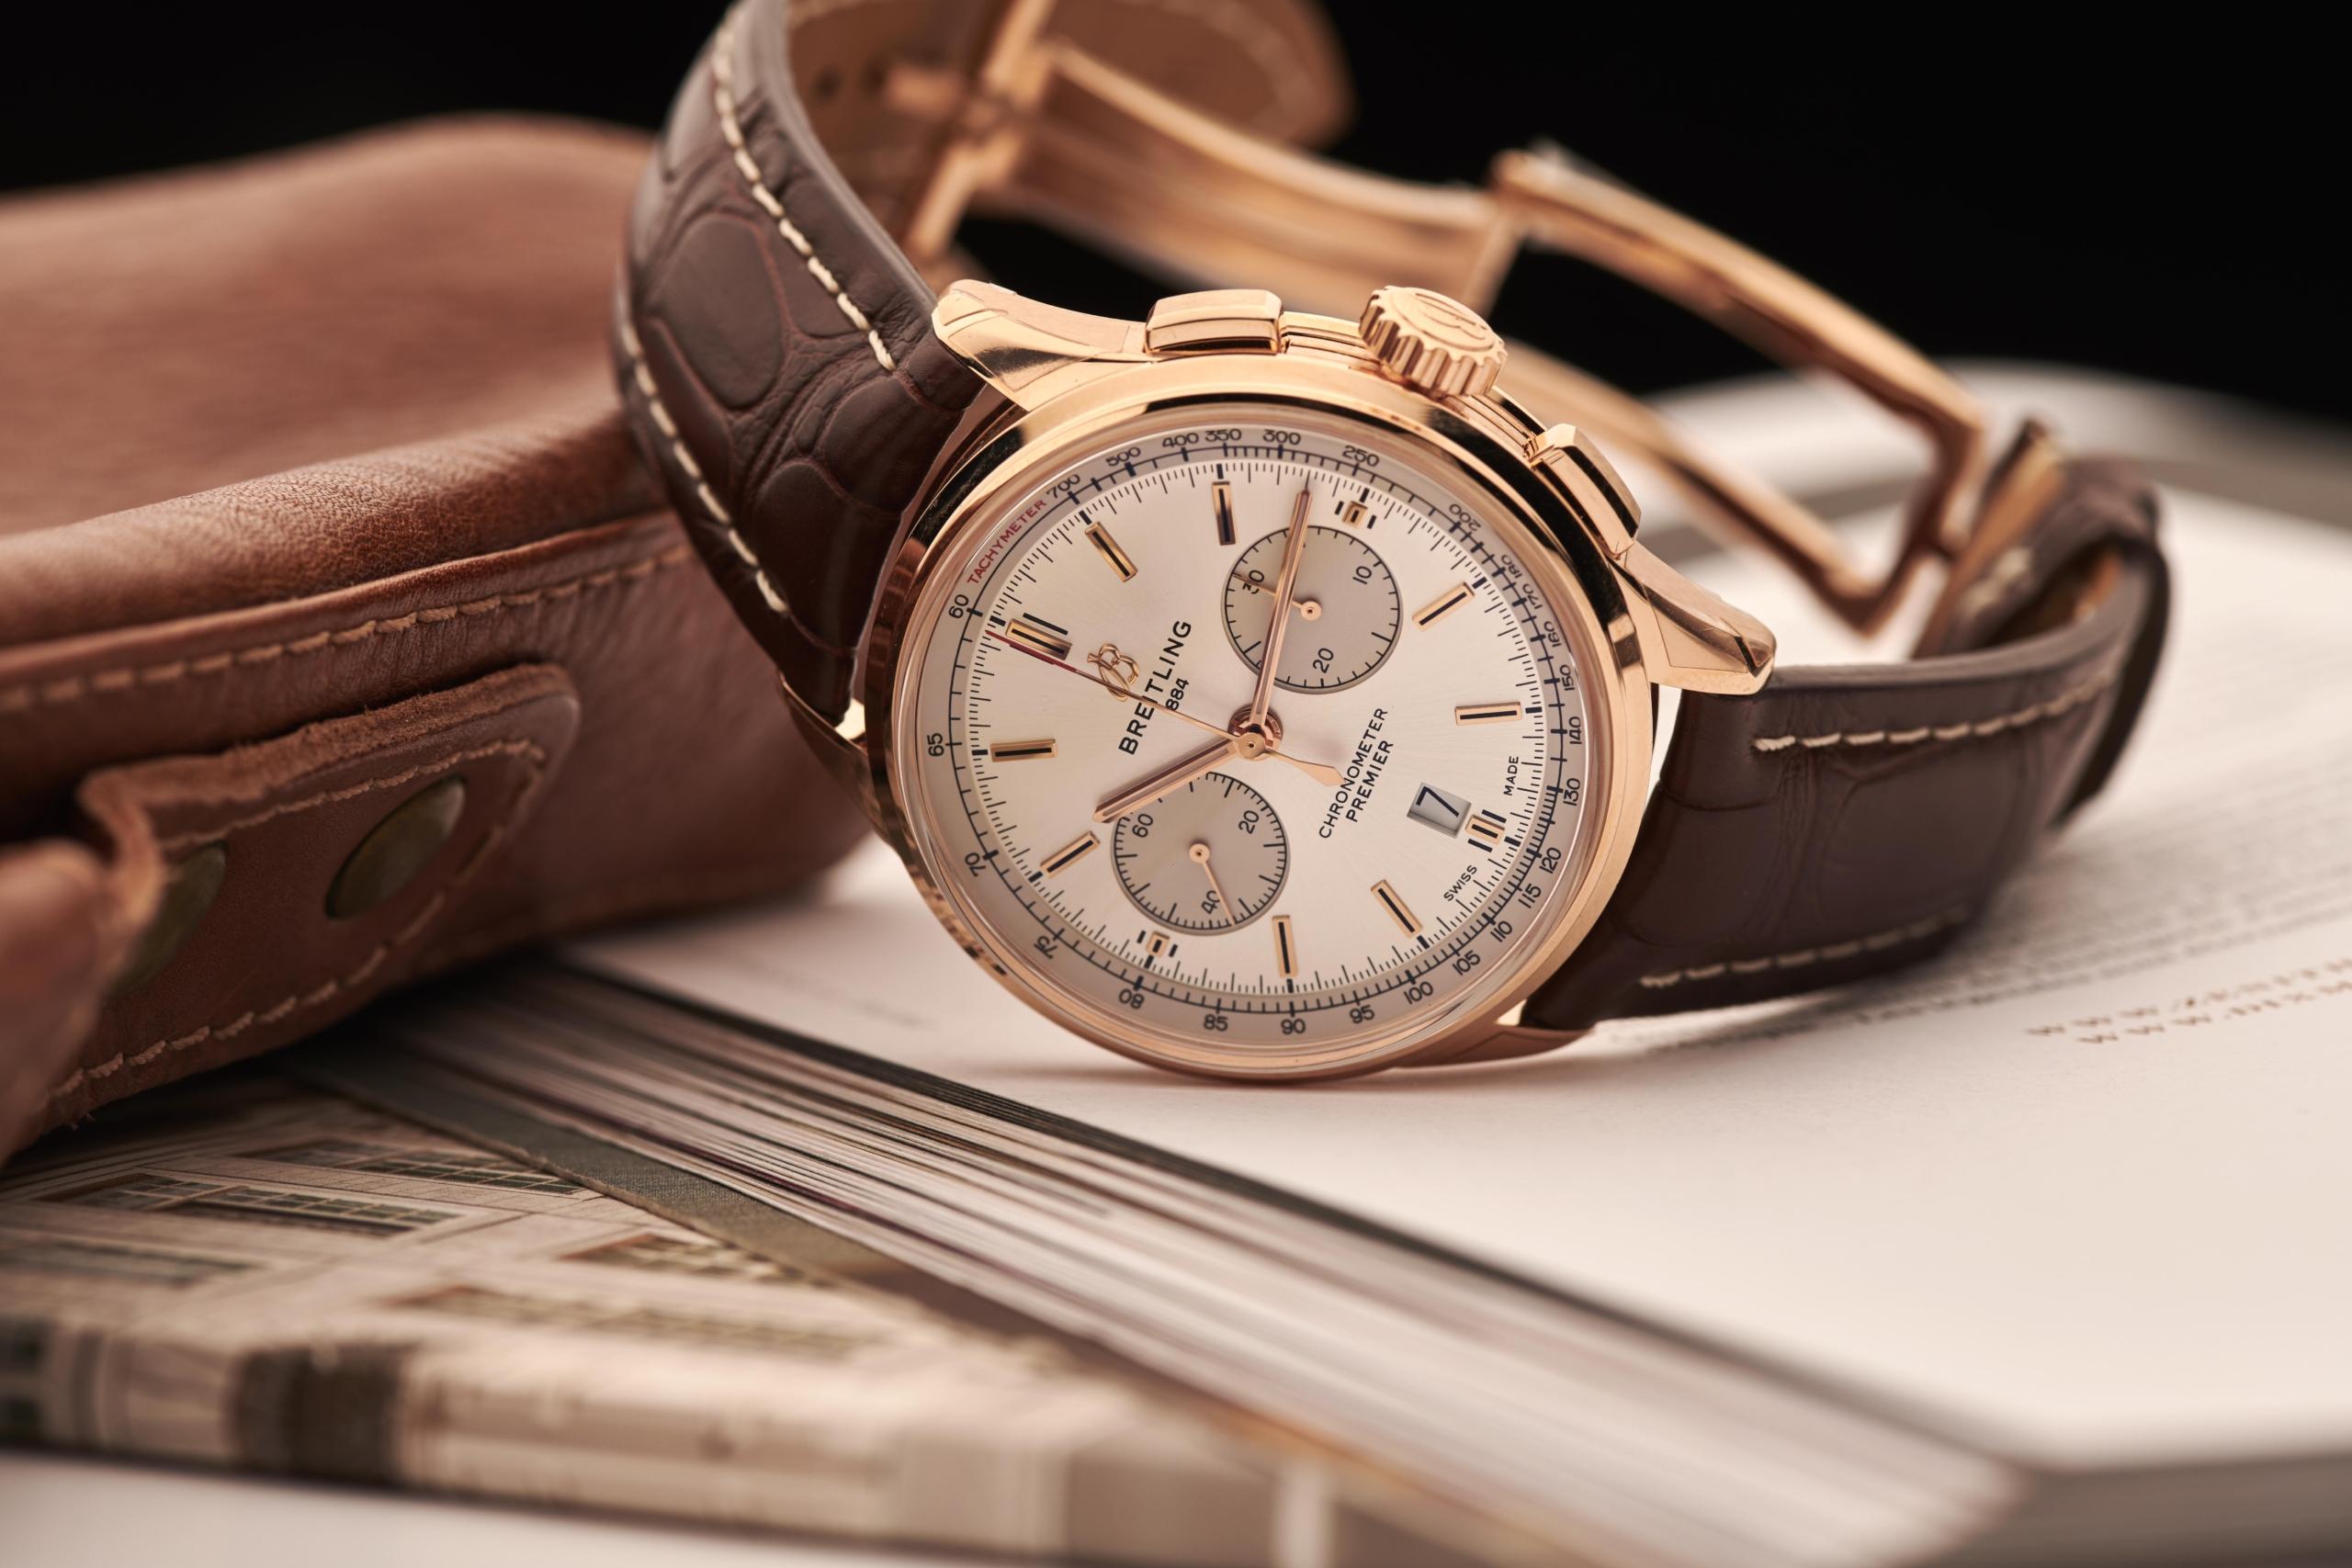 Breitling Premier Chronograph 18kt gold